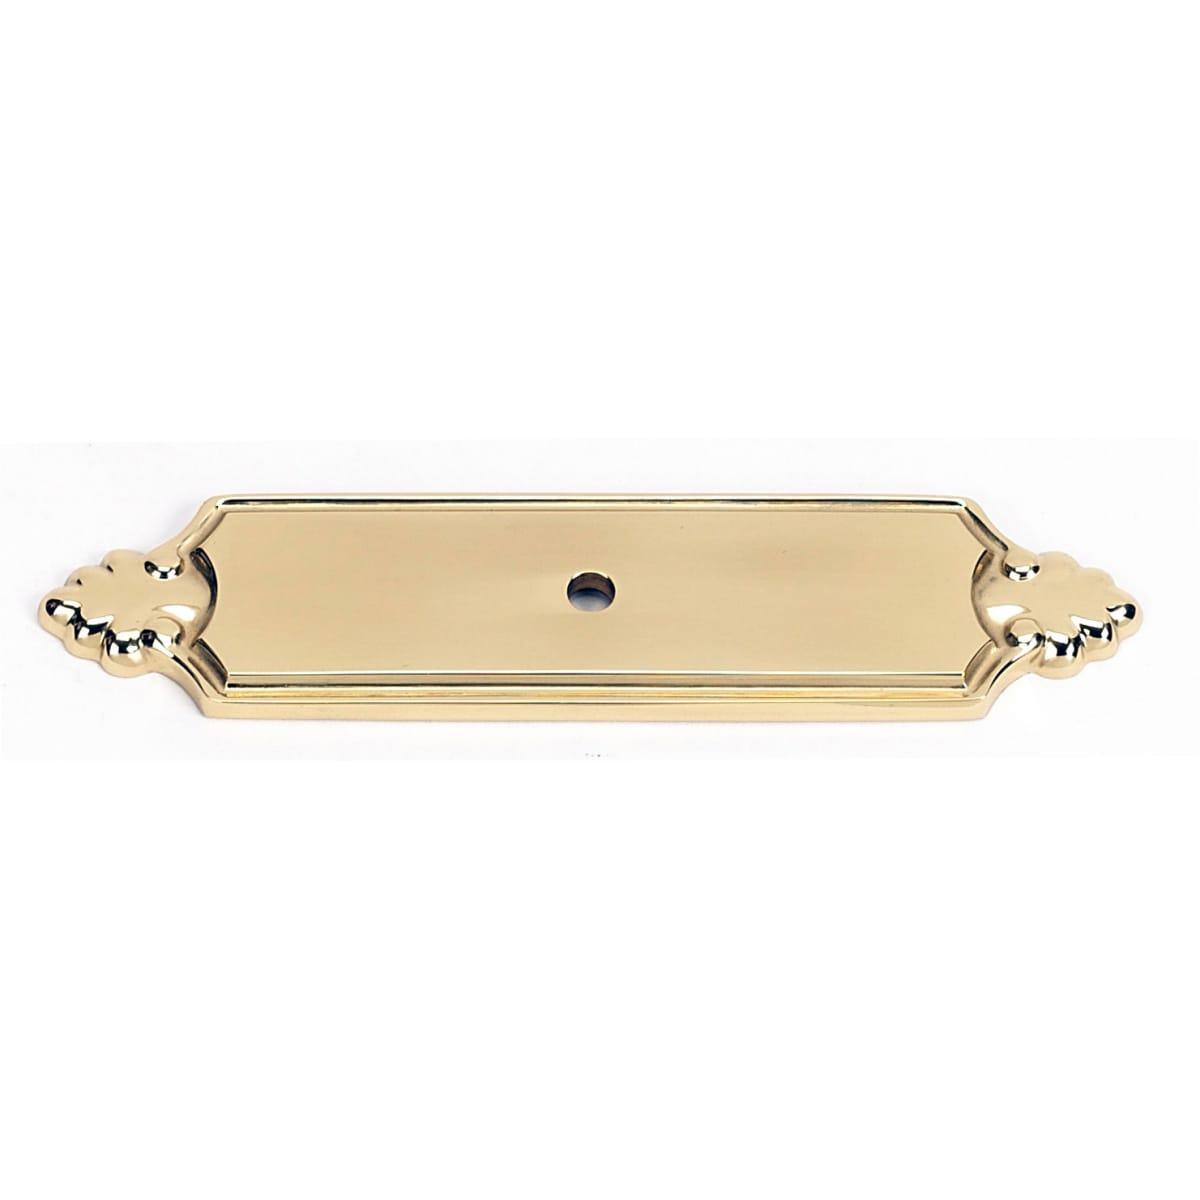 Alno Bella 4-1/4 Inch Long Cabinet Knob Backplate